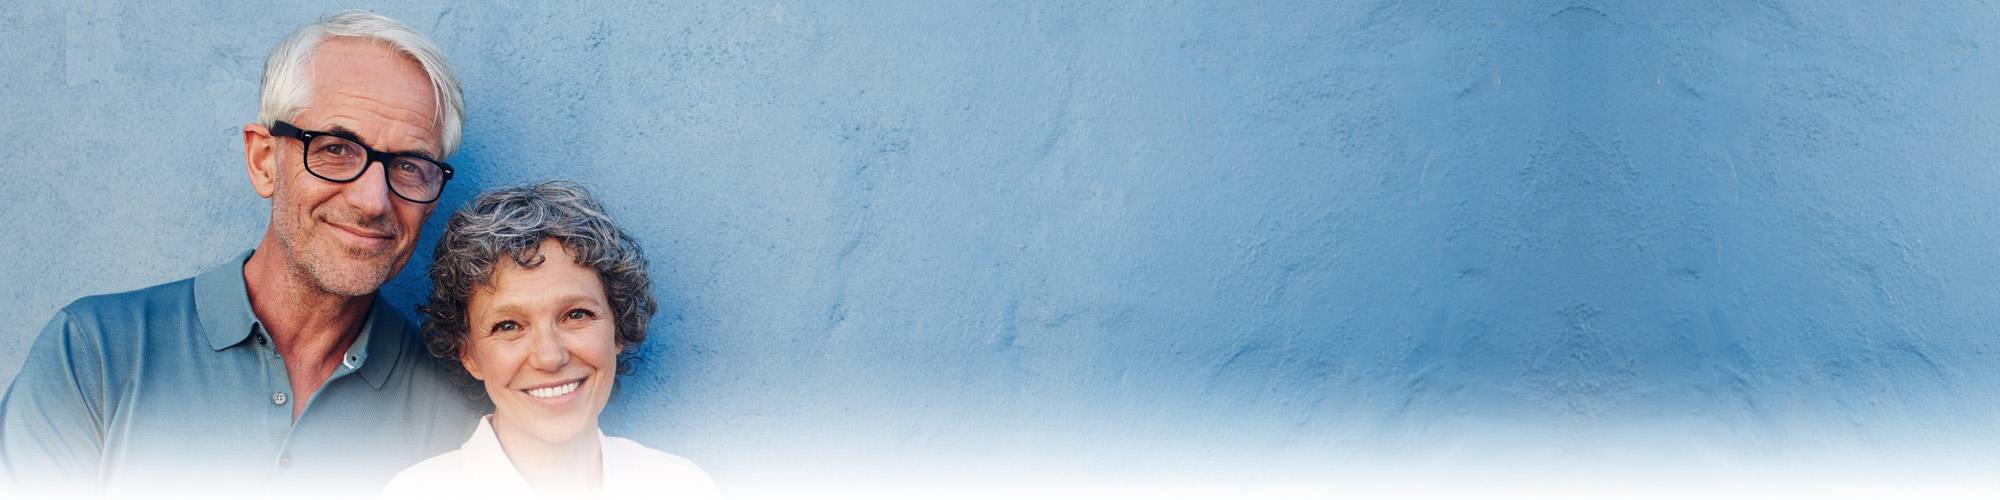 ChildPages-senior-blue